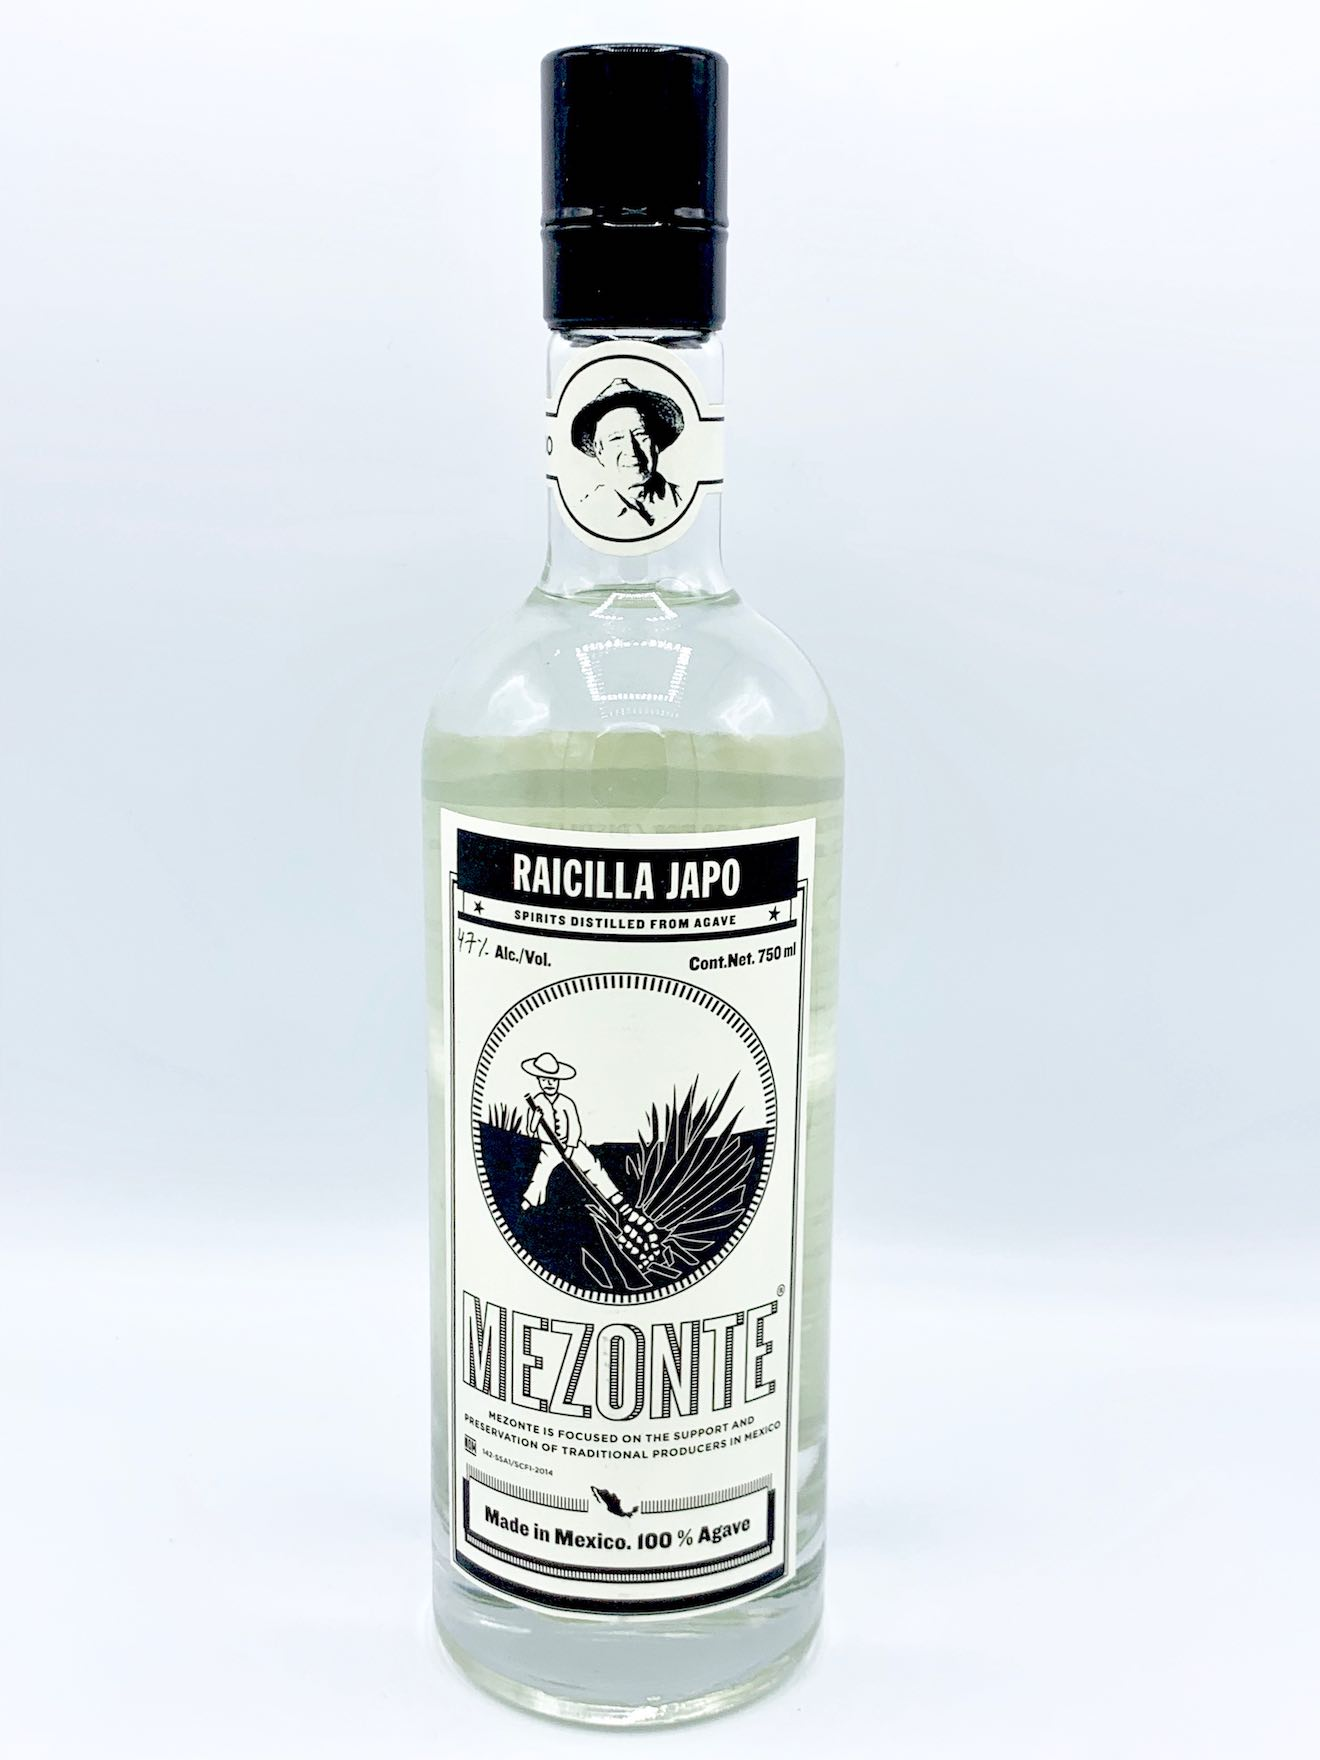 Mezonte - Japo Agave Spirit (Jalisco, Mexico)